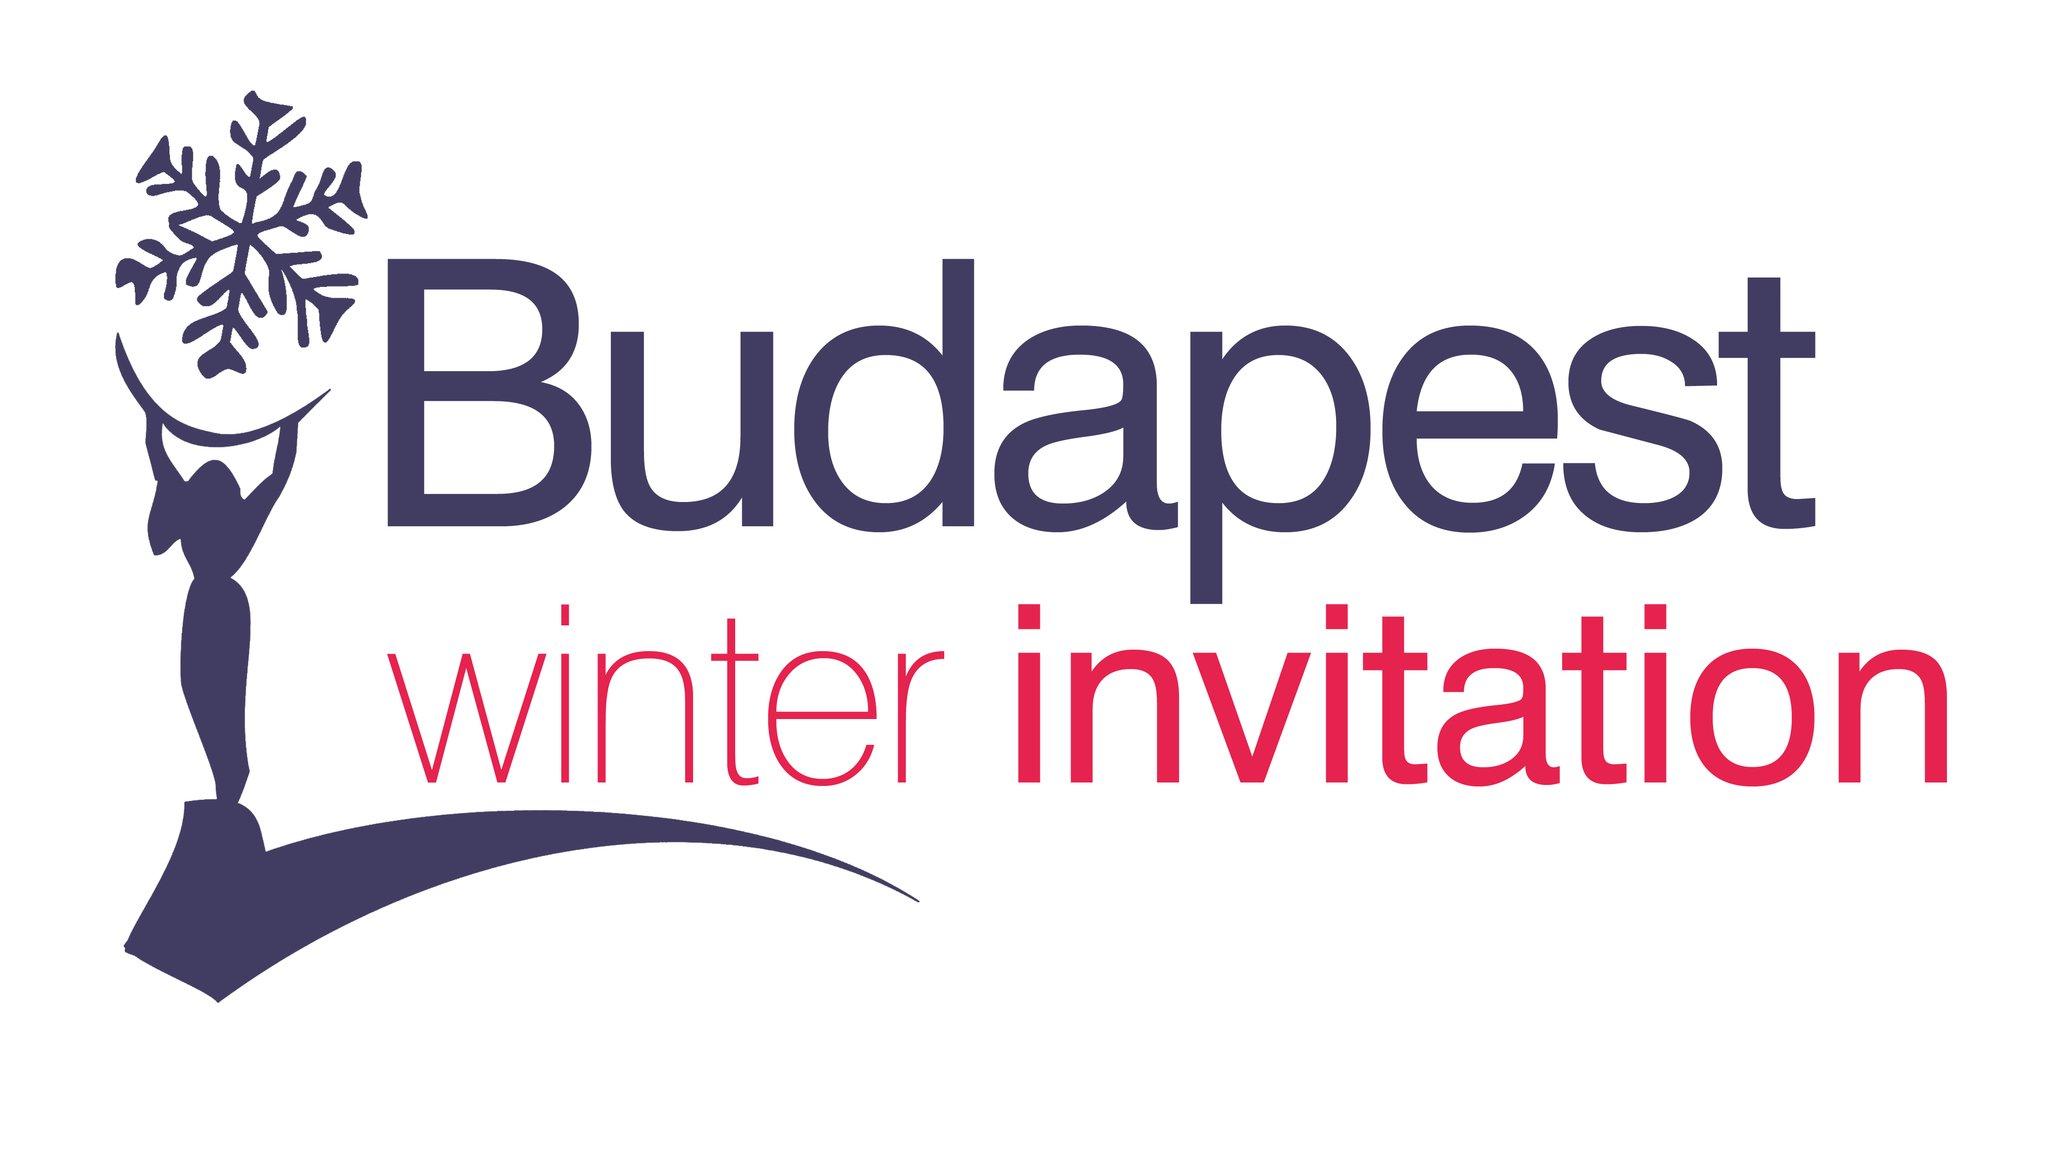 The Budapest Winter Invitation 2013